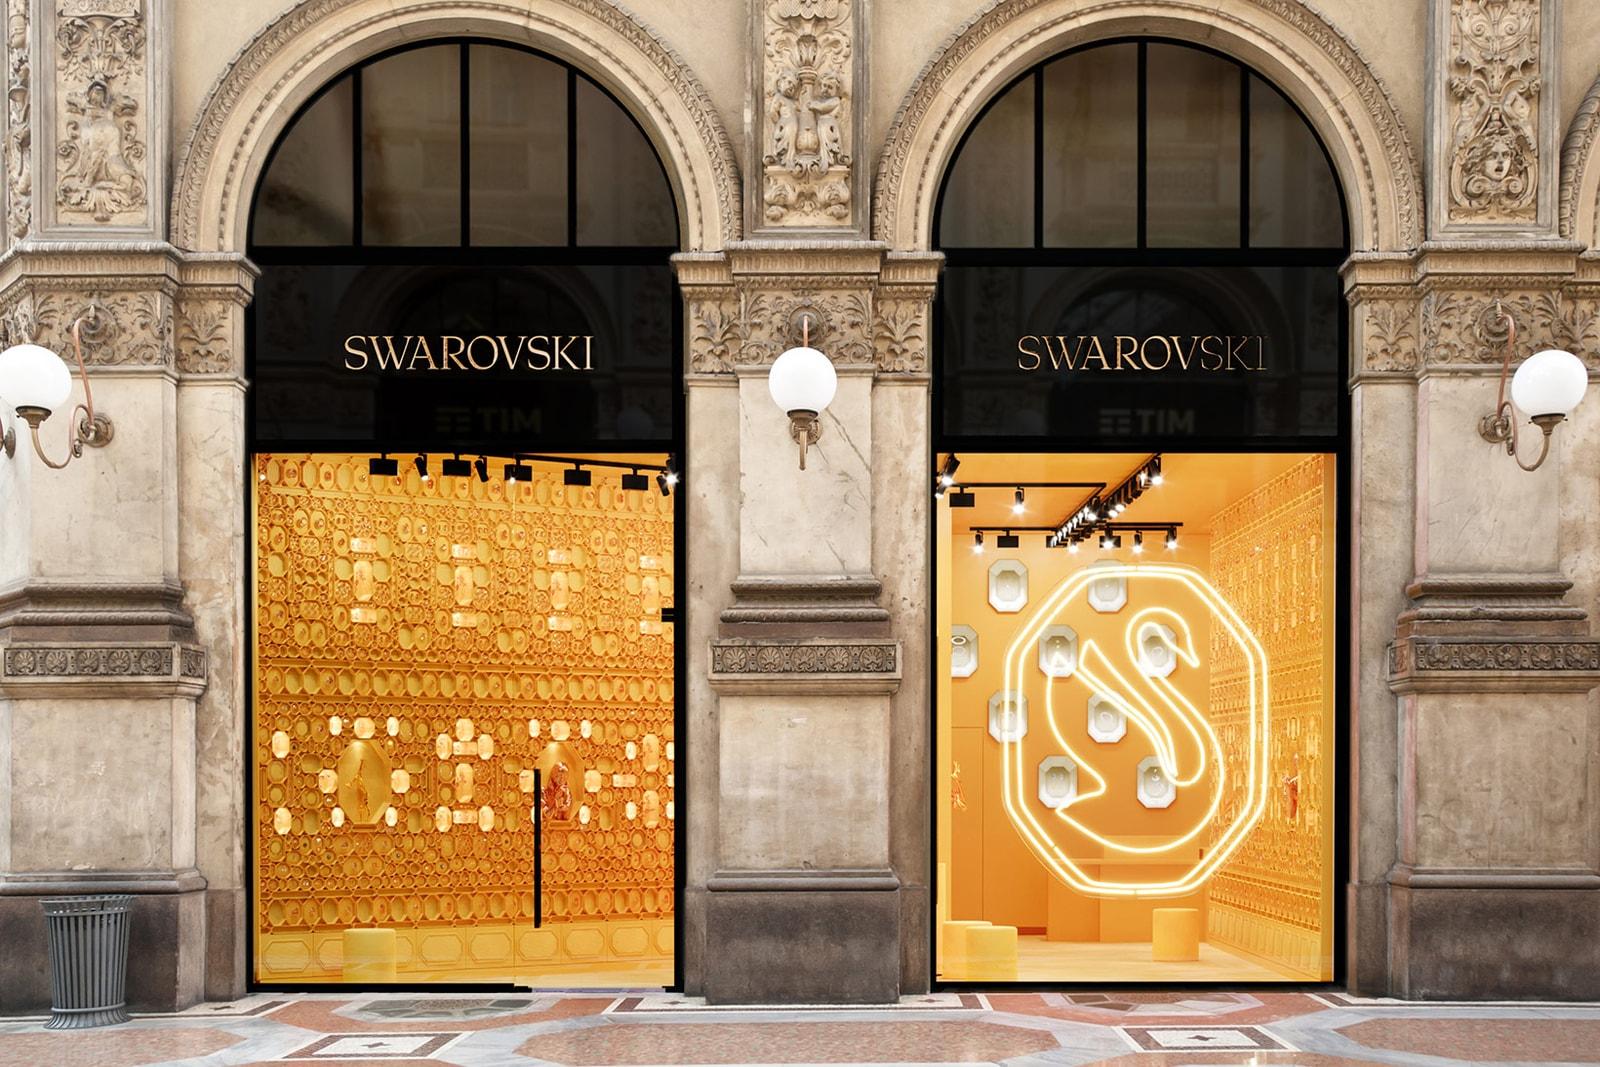 swarovski rebrand redesign store adwoa aboah campaign jewelry